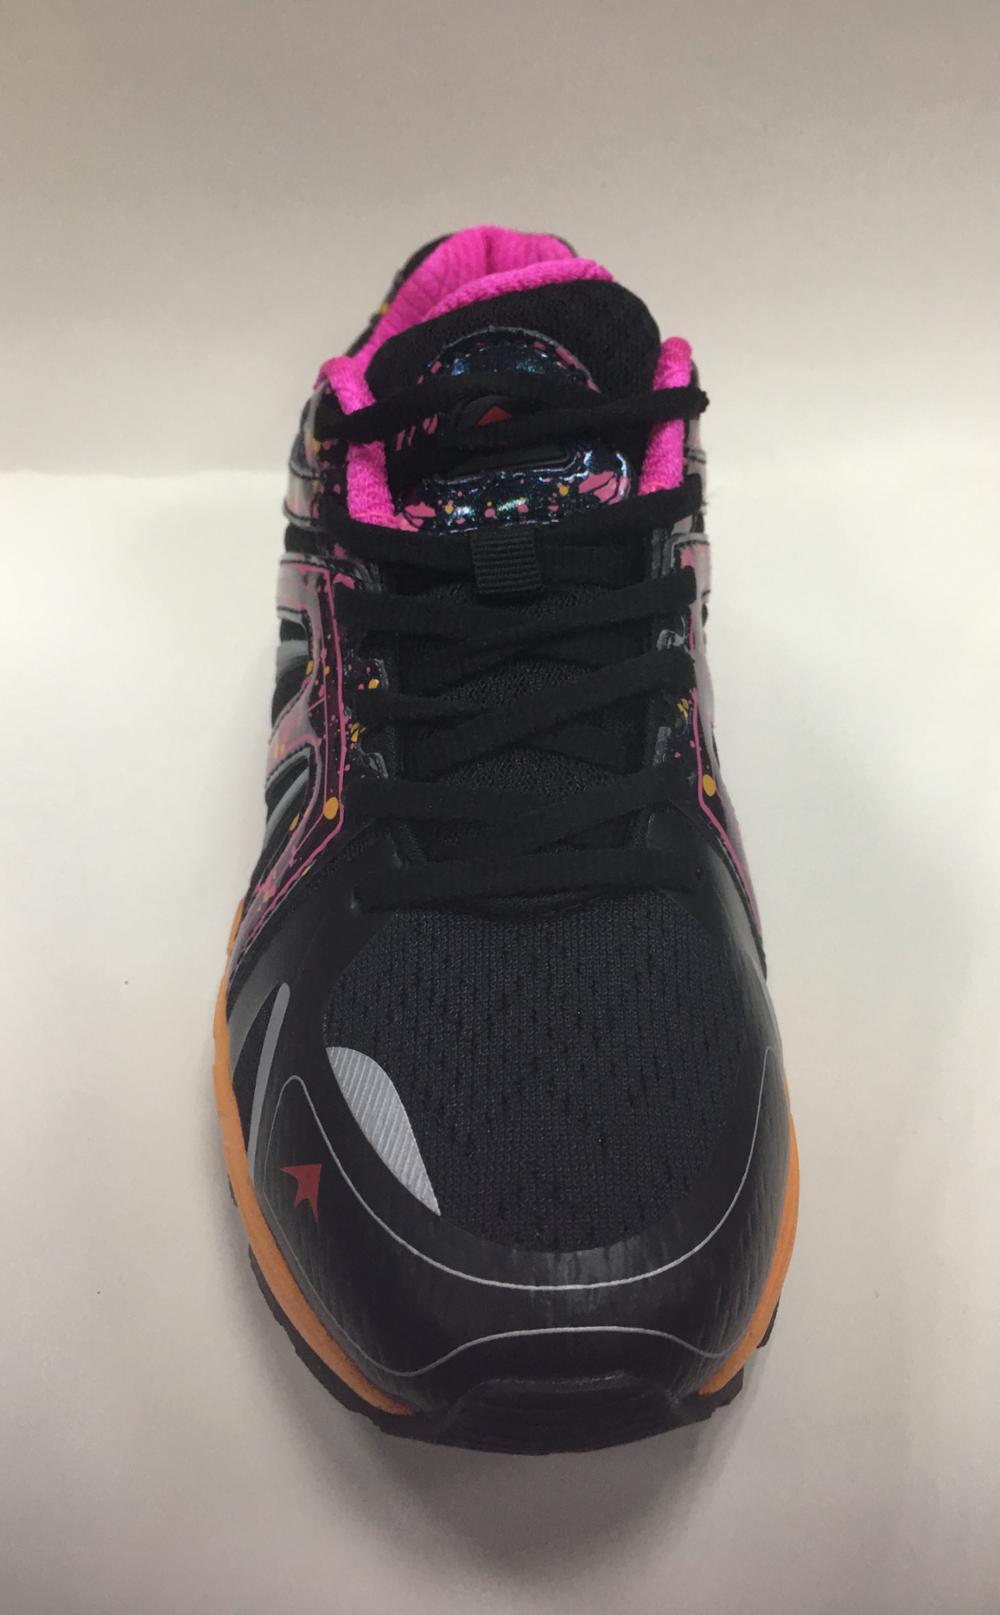 shoes cheap shoes Jogging running sneakers men men for pqH1Pwq